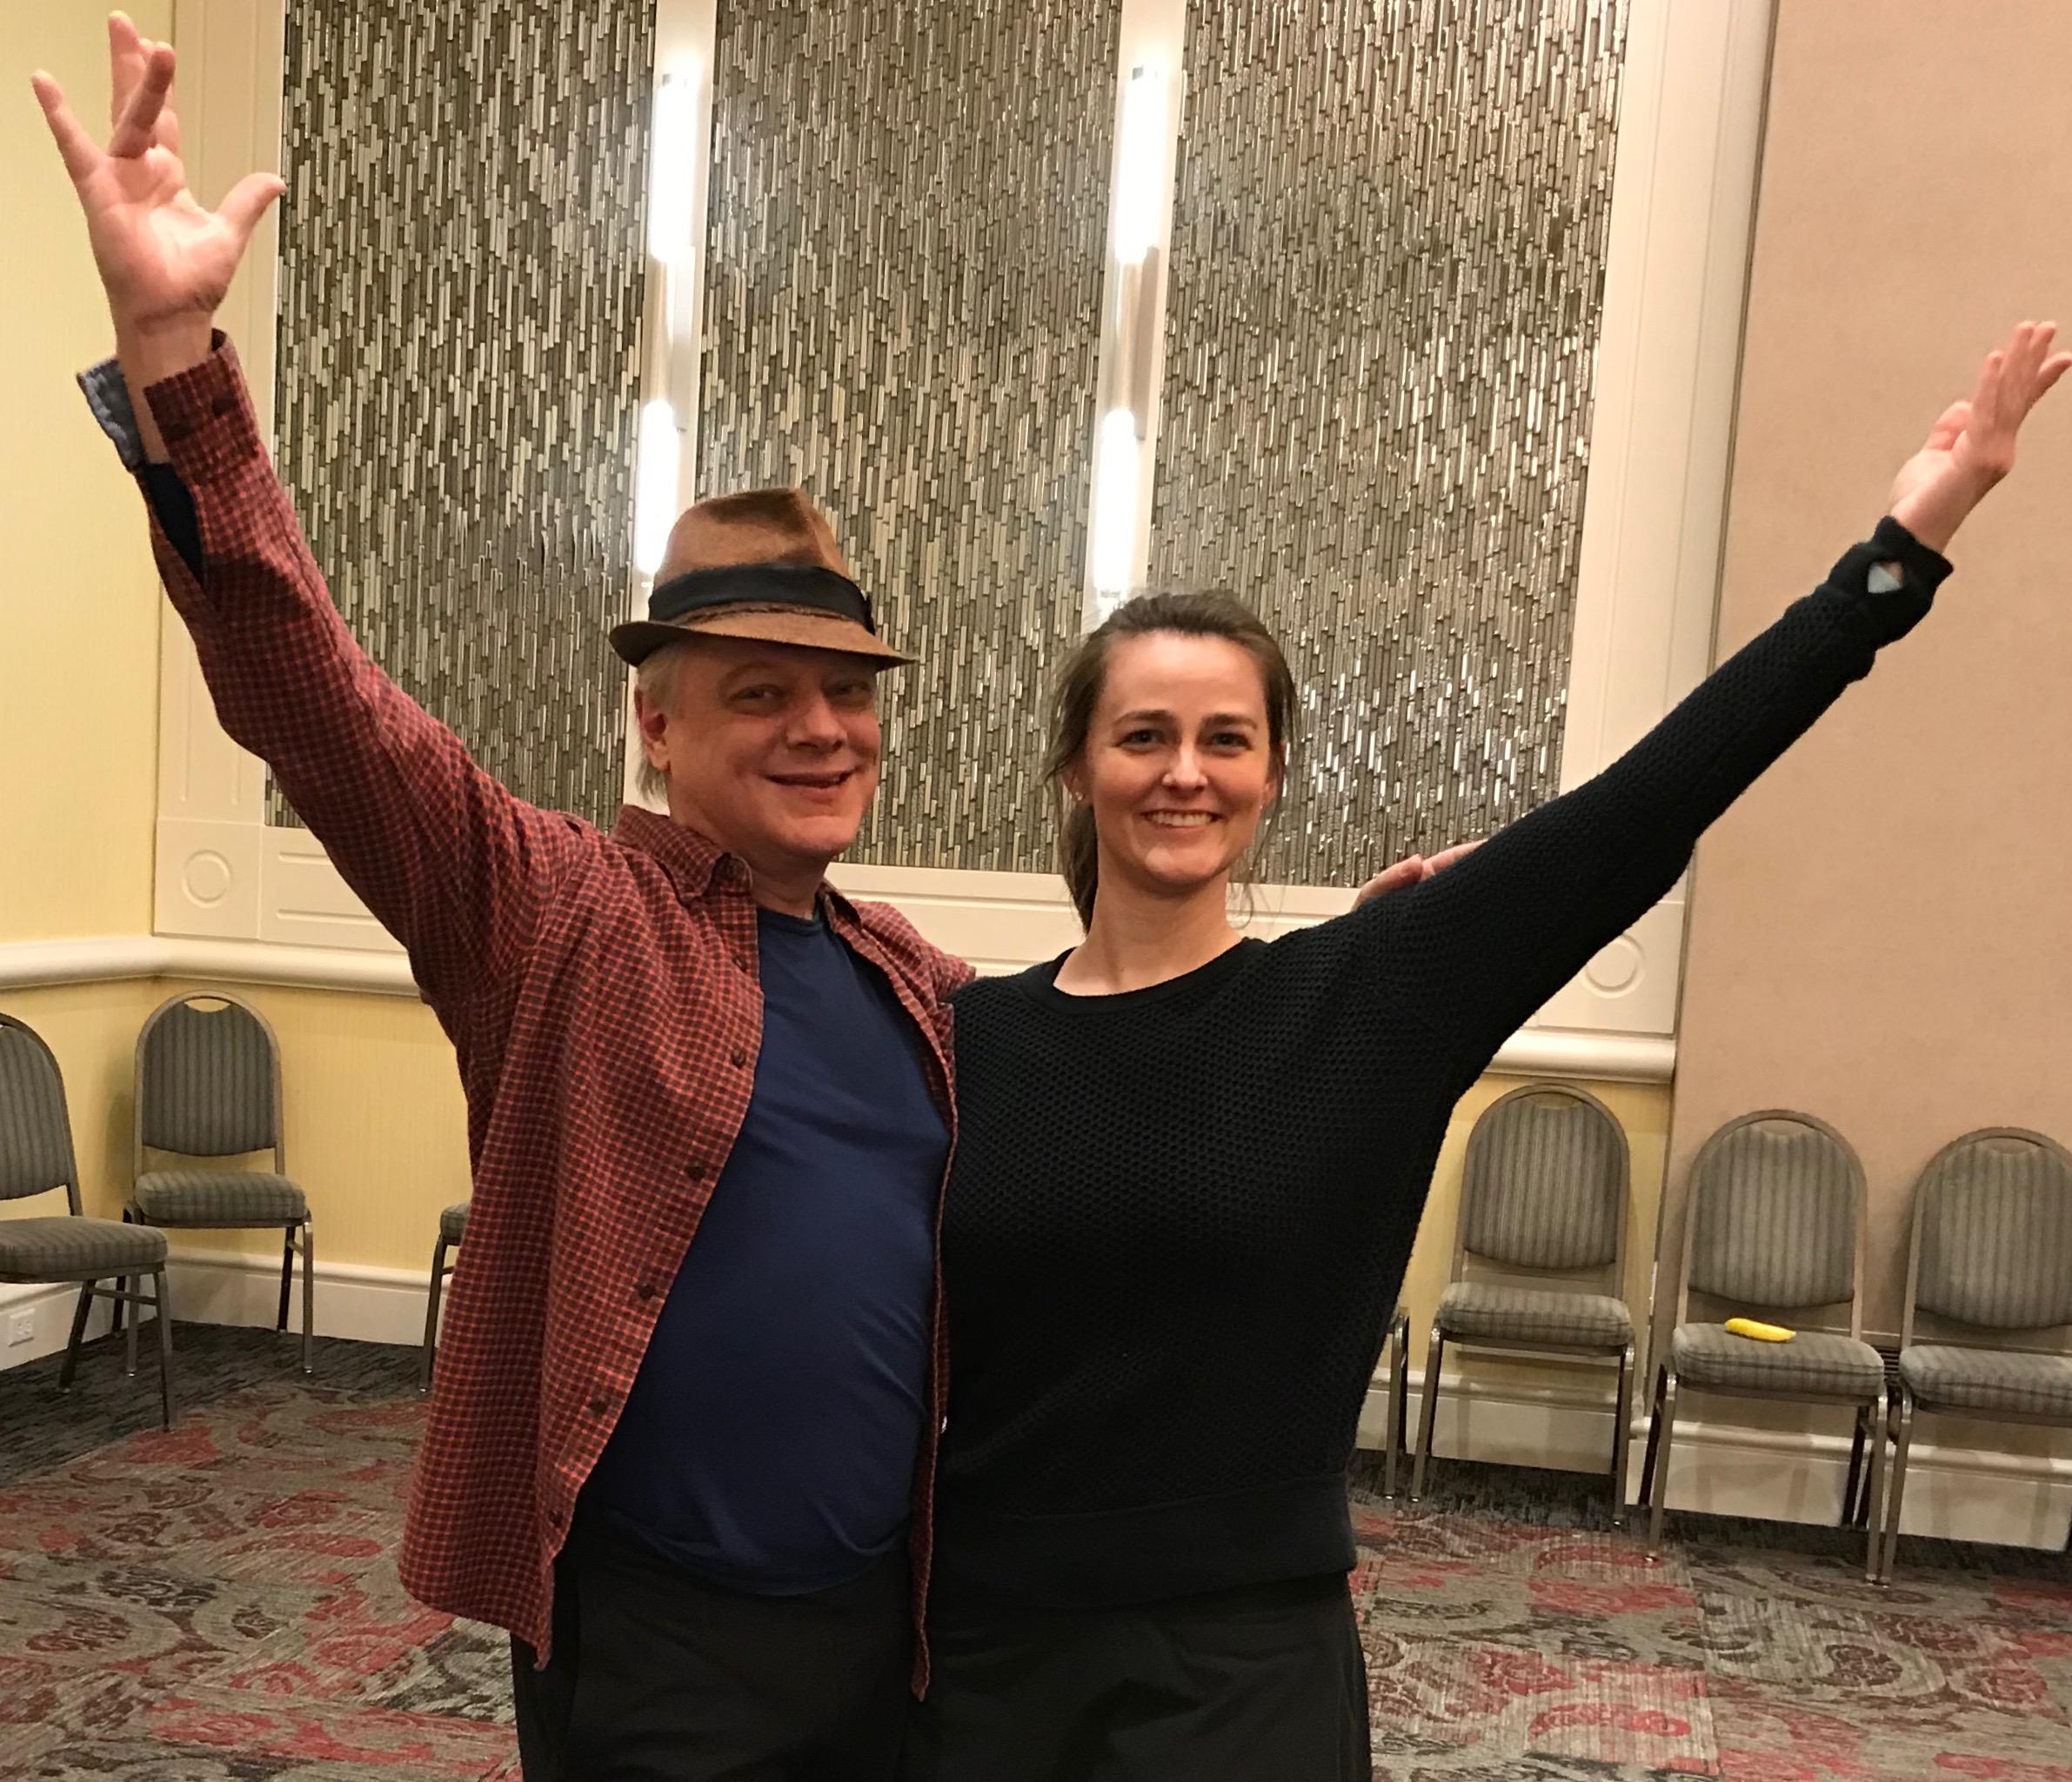 Francis J. Roach & Jen Westphal @ IUPUI Luigi Jazz Dance Master Class, Indianapolis, Indiana 2019